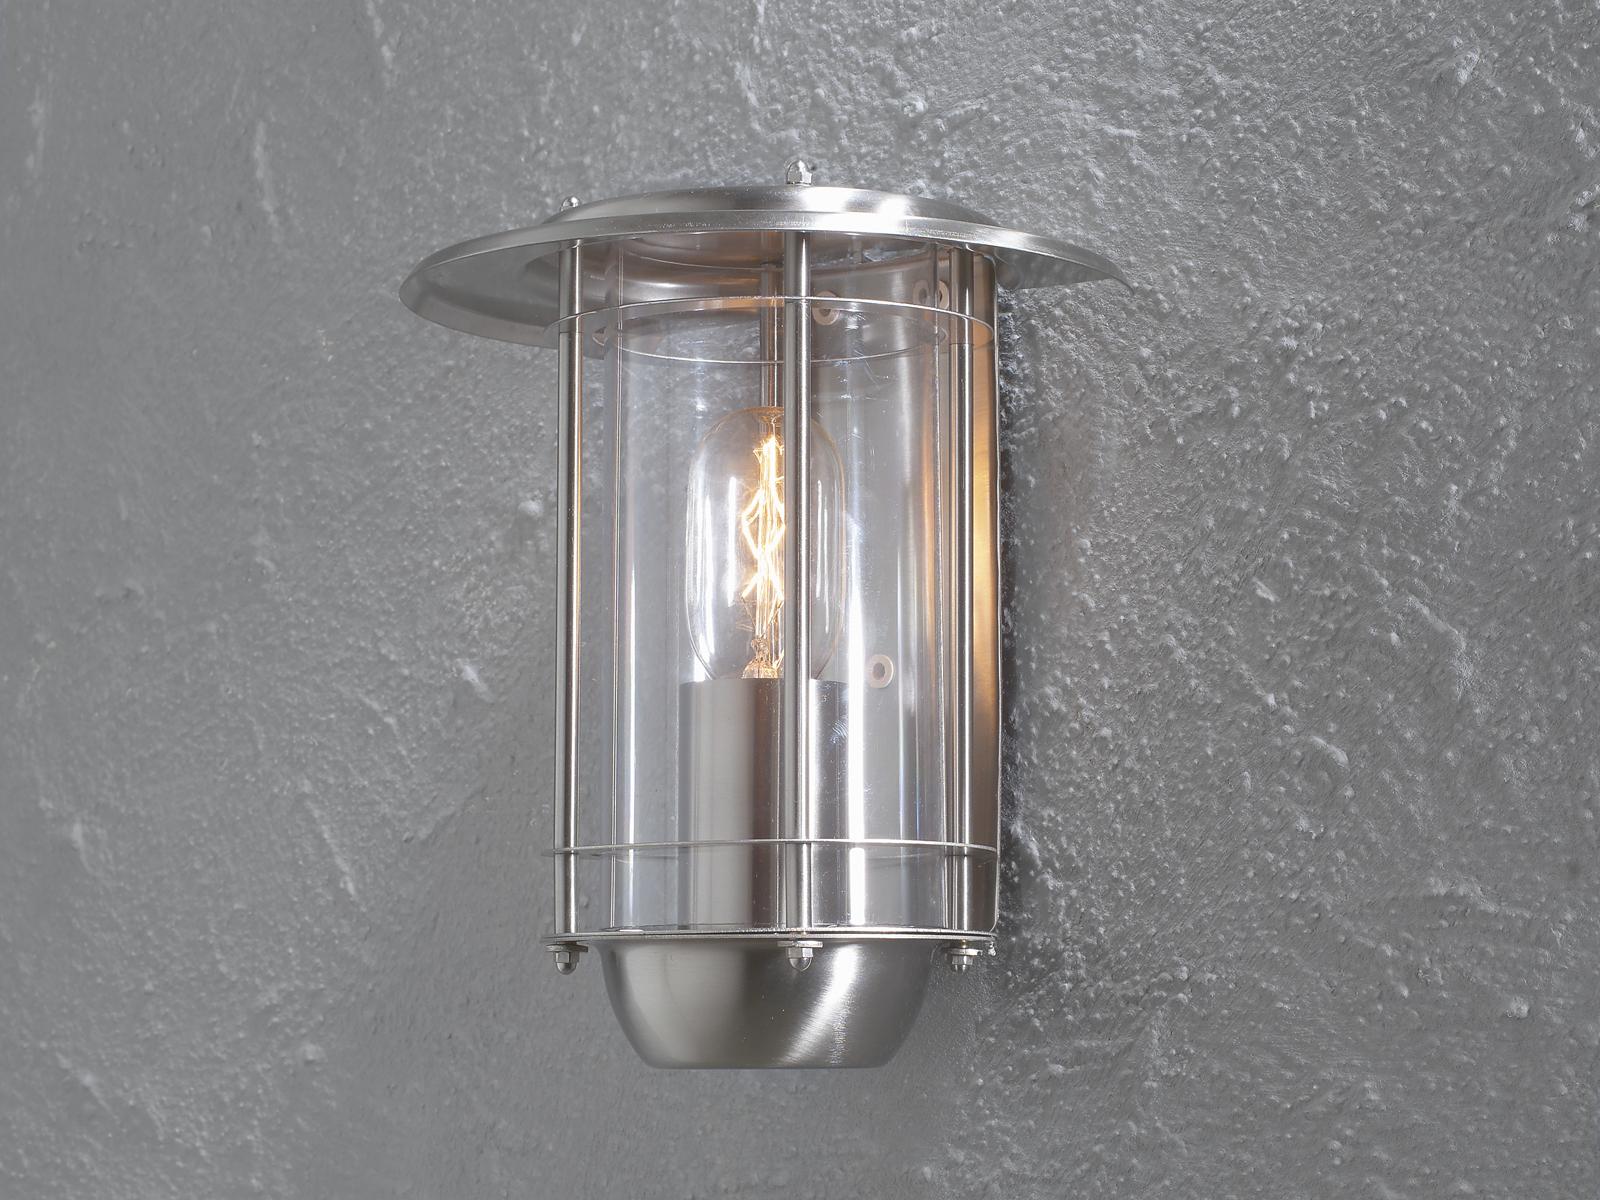 Konstsmide Trento Wandleuchte 7565-000 Wandlampe Aussenlampe Gartenlampe Lampe Lampen & Licht